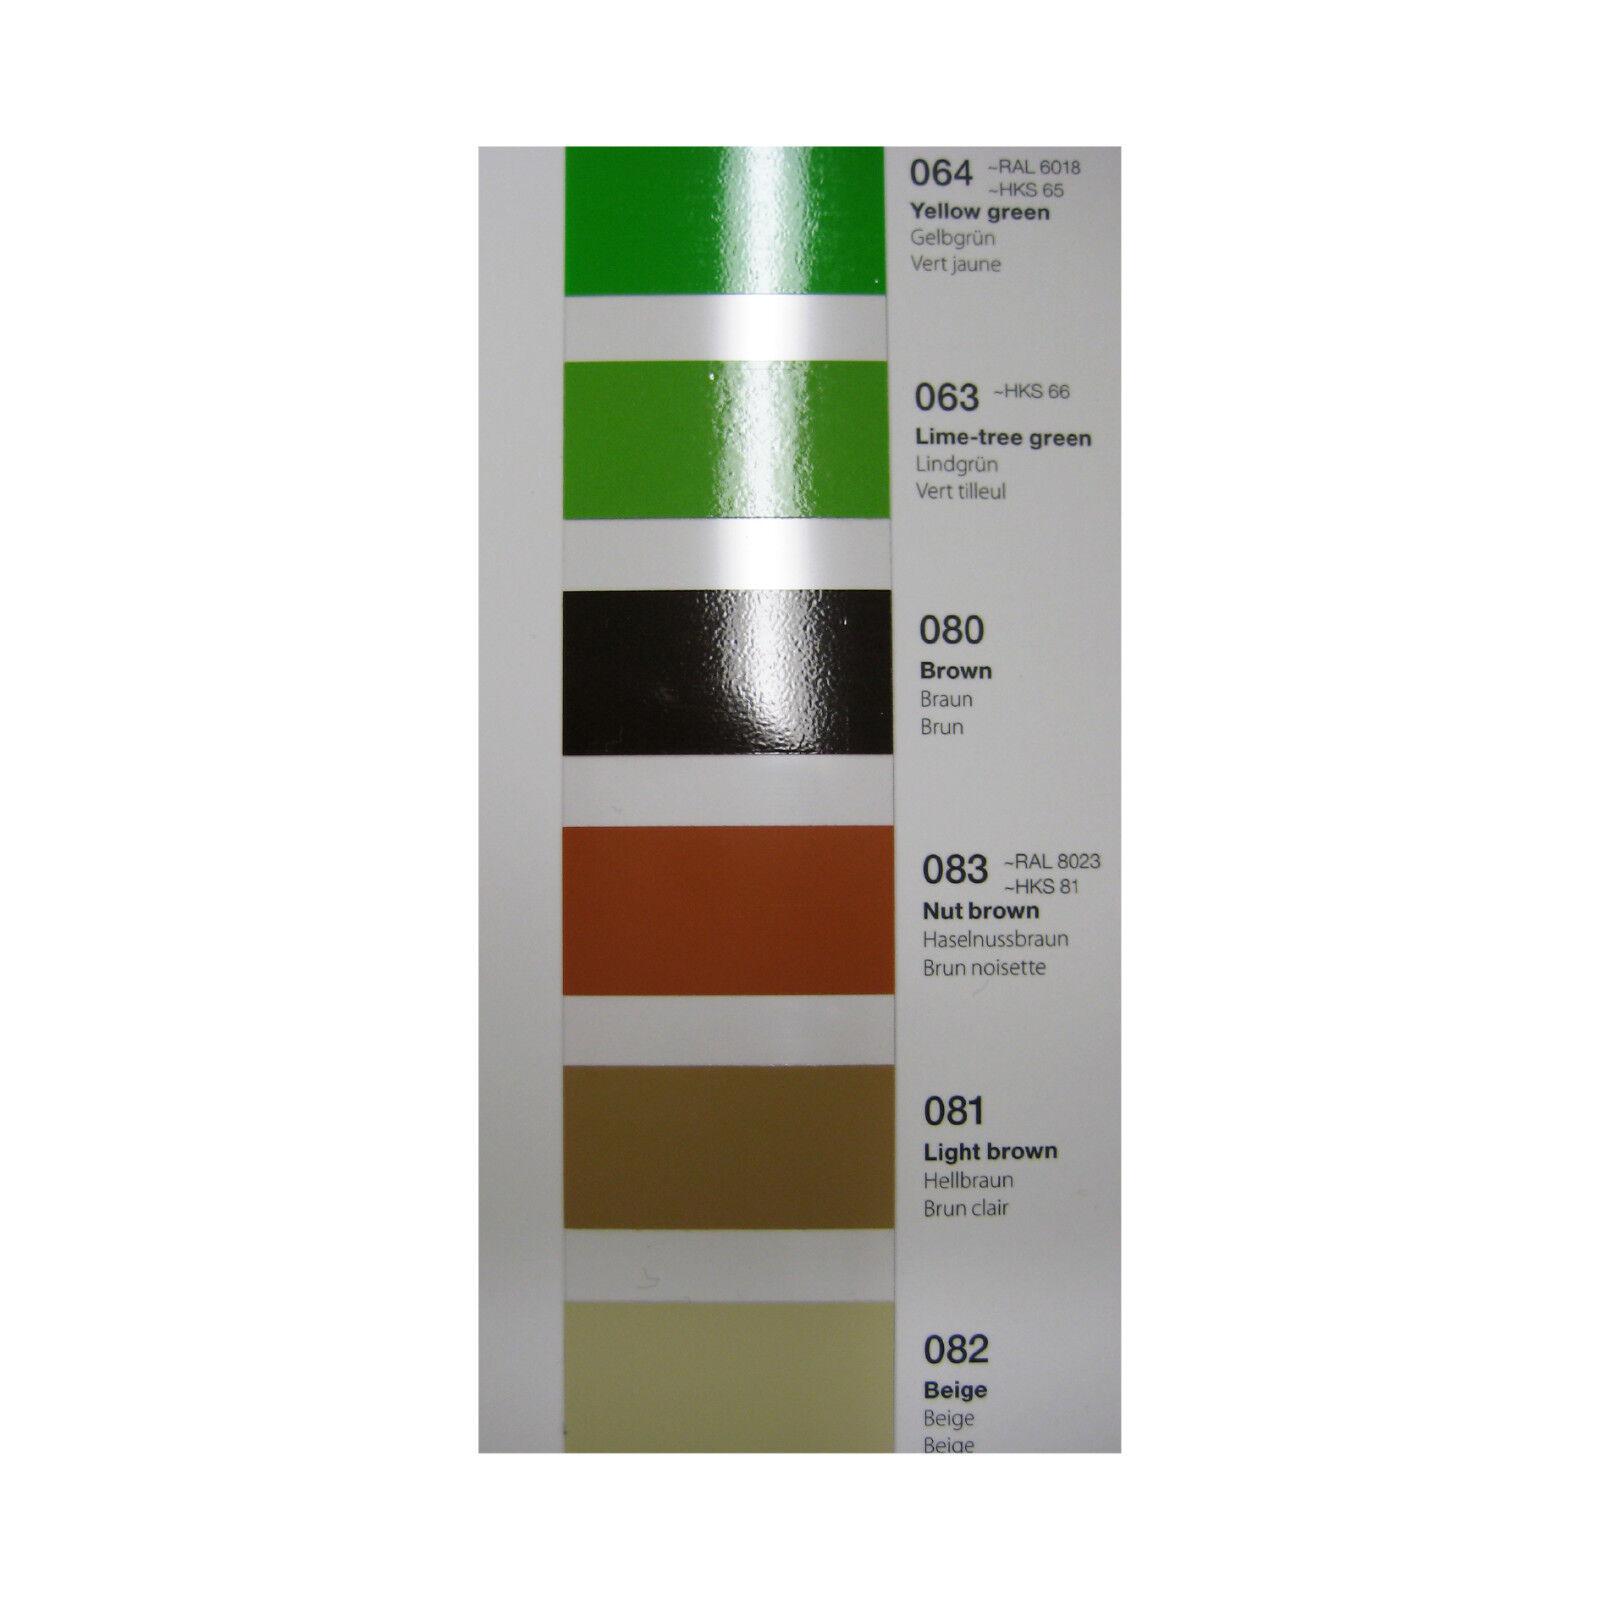 Oracal 651 Color Fan Colour Patterns Chart Booklet Folder for Films Cutters